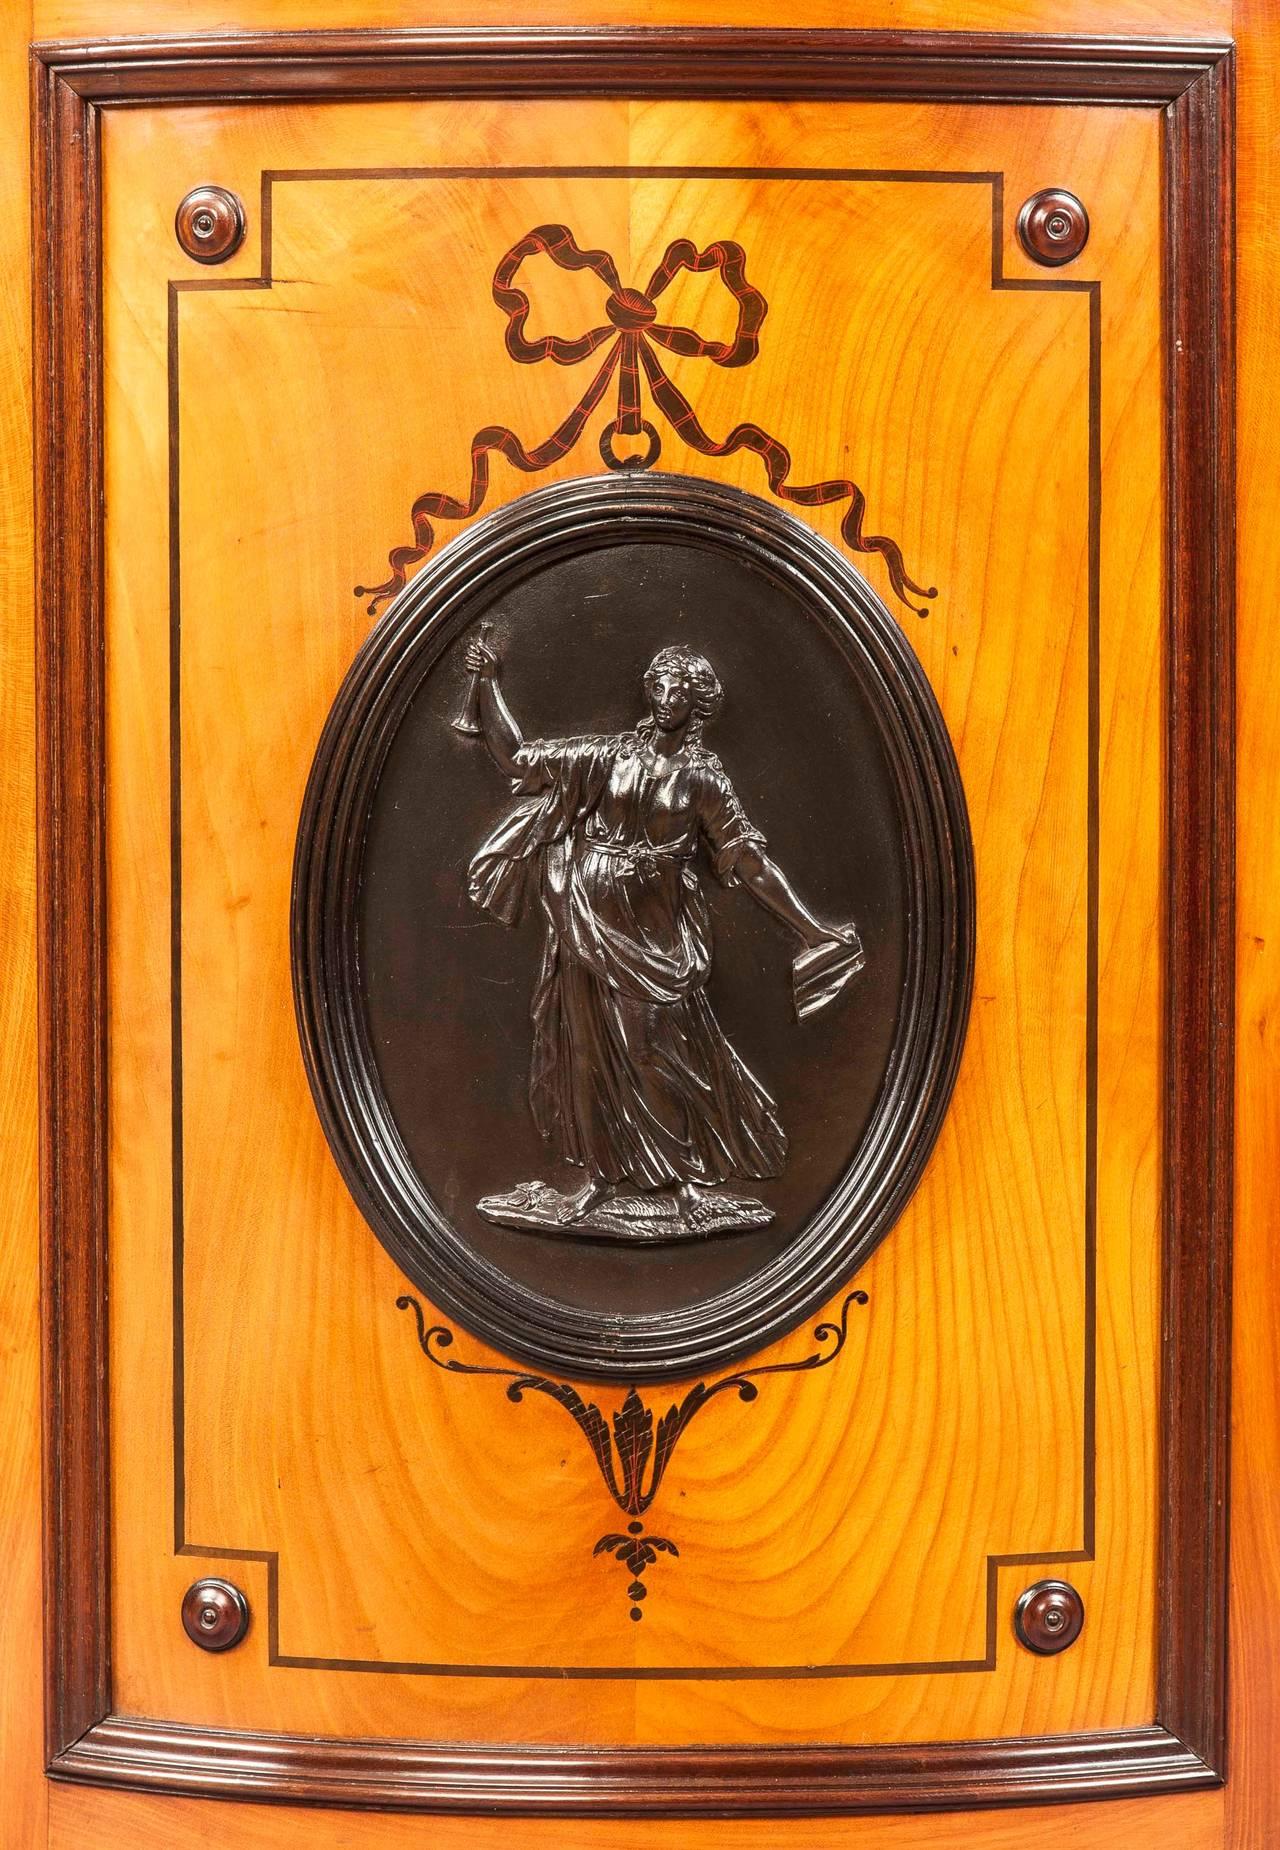 Neoclassical Antique Kidney Desk